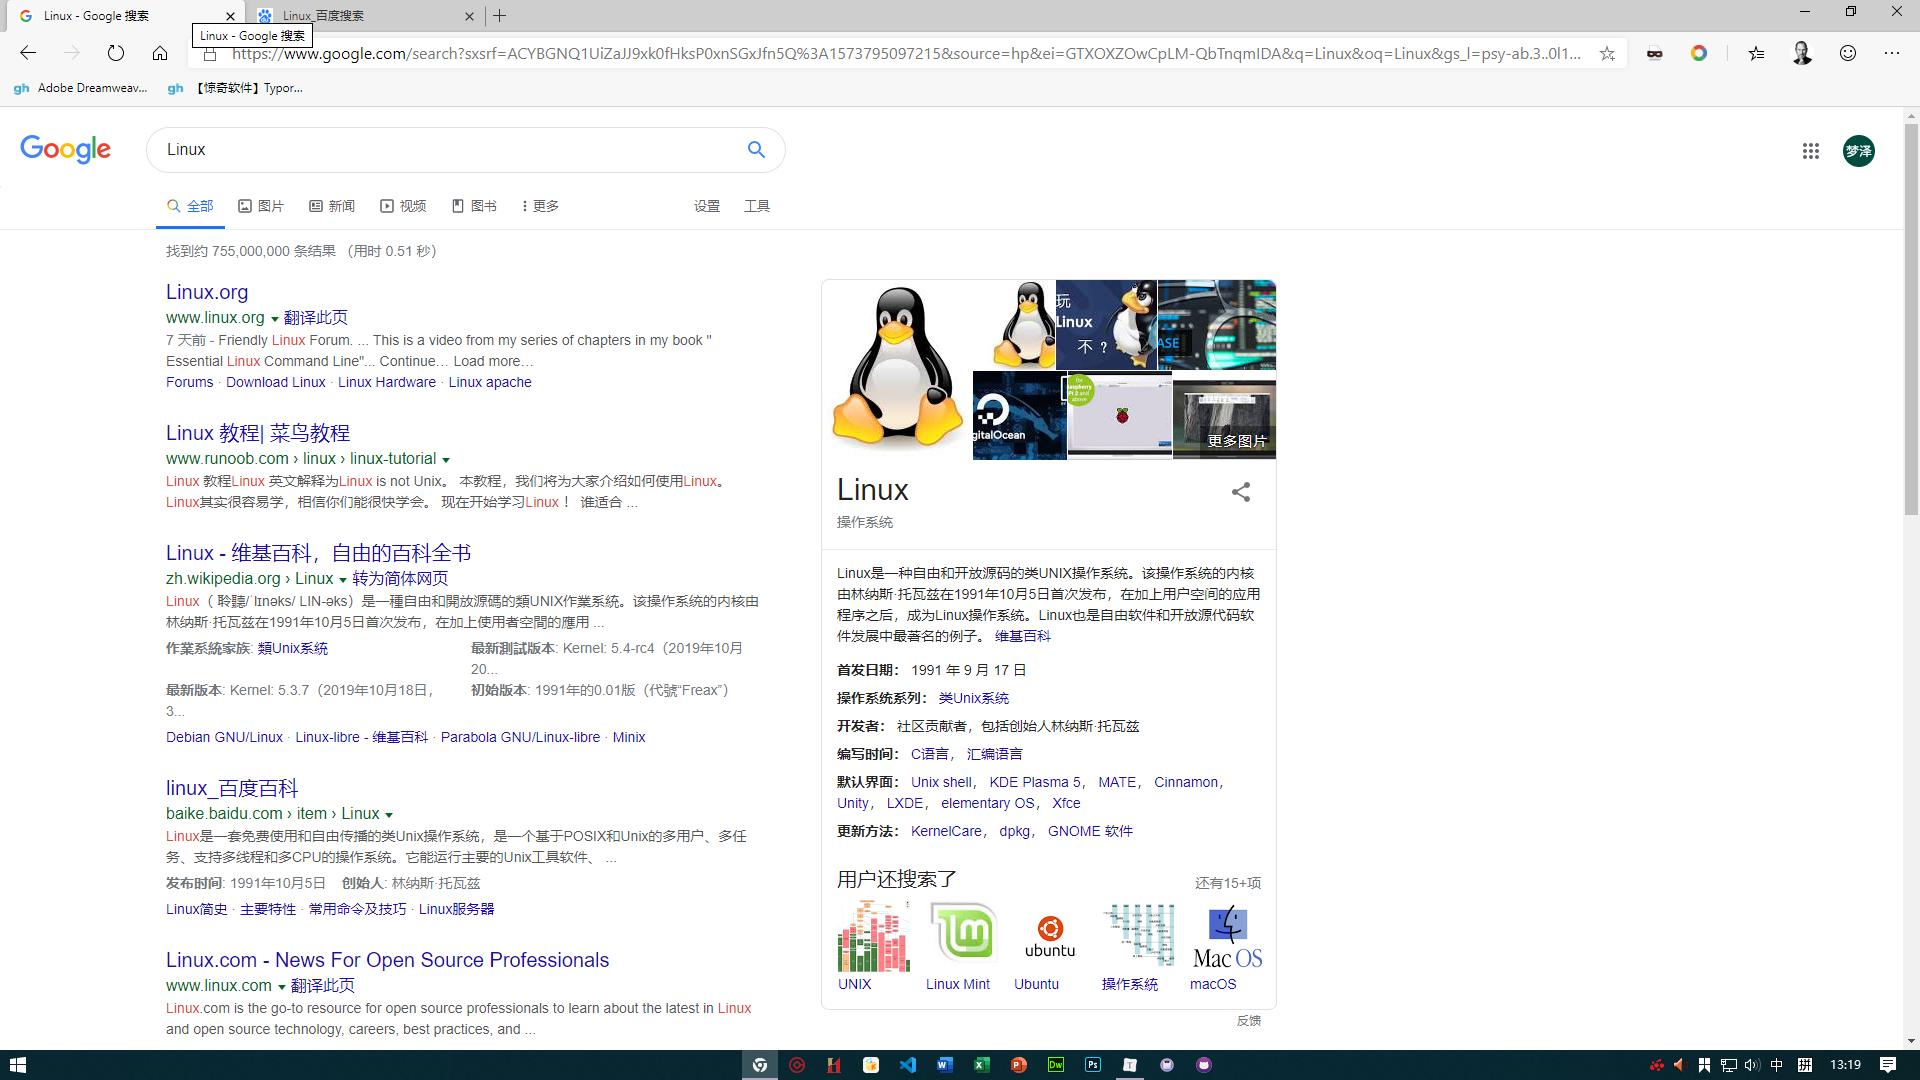 Linux-Google